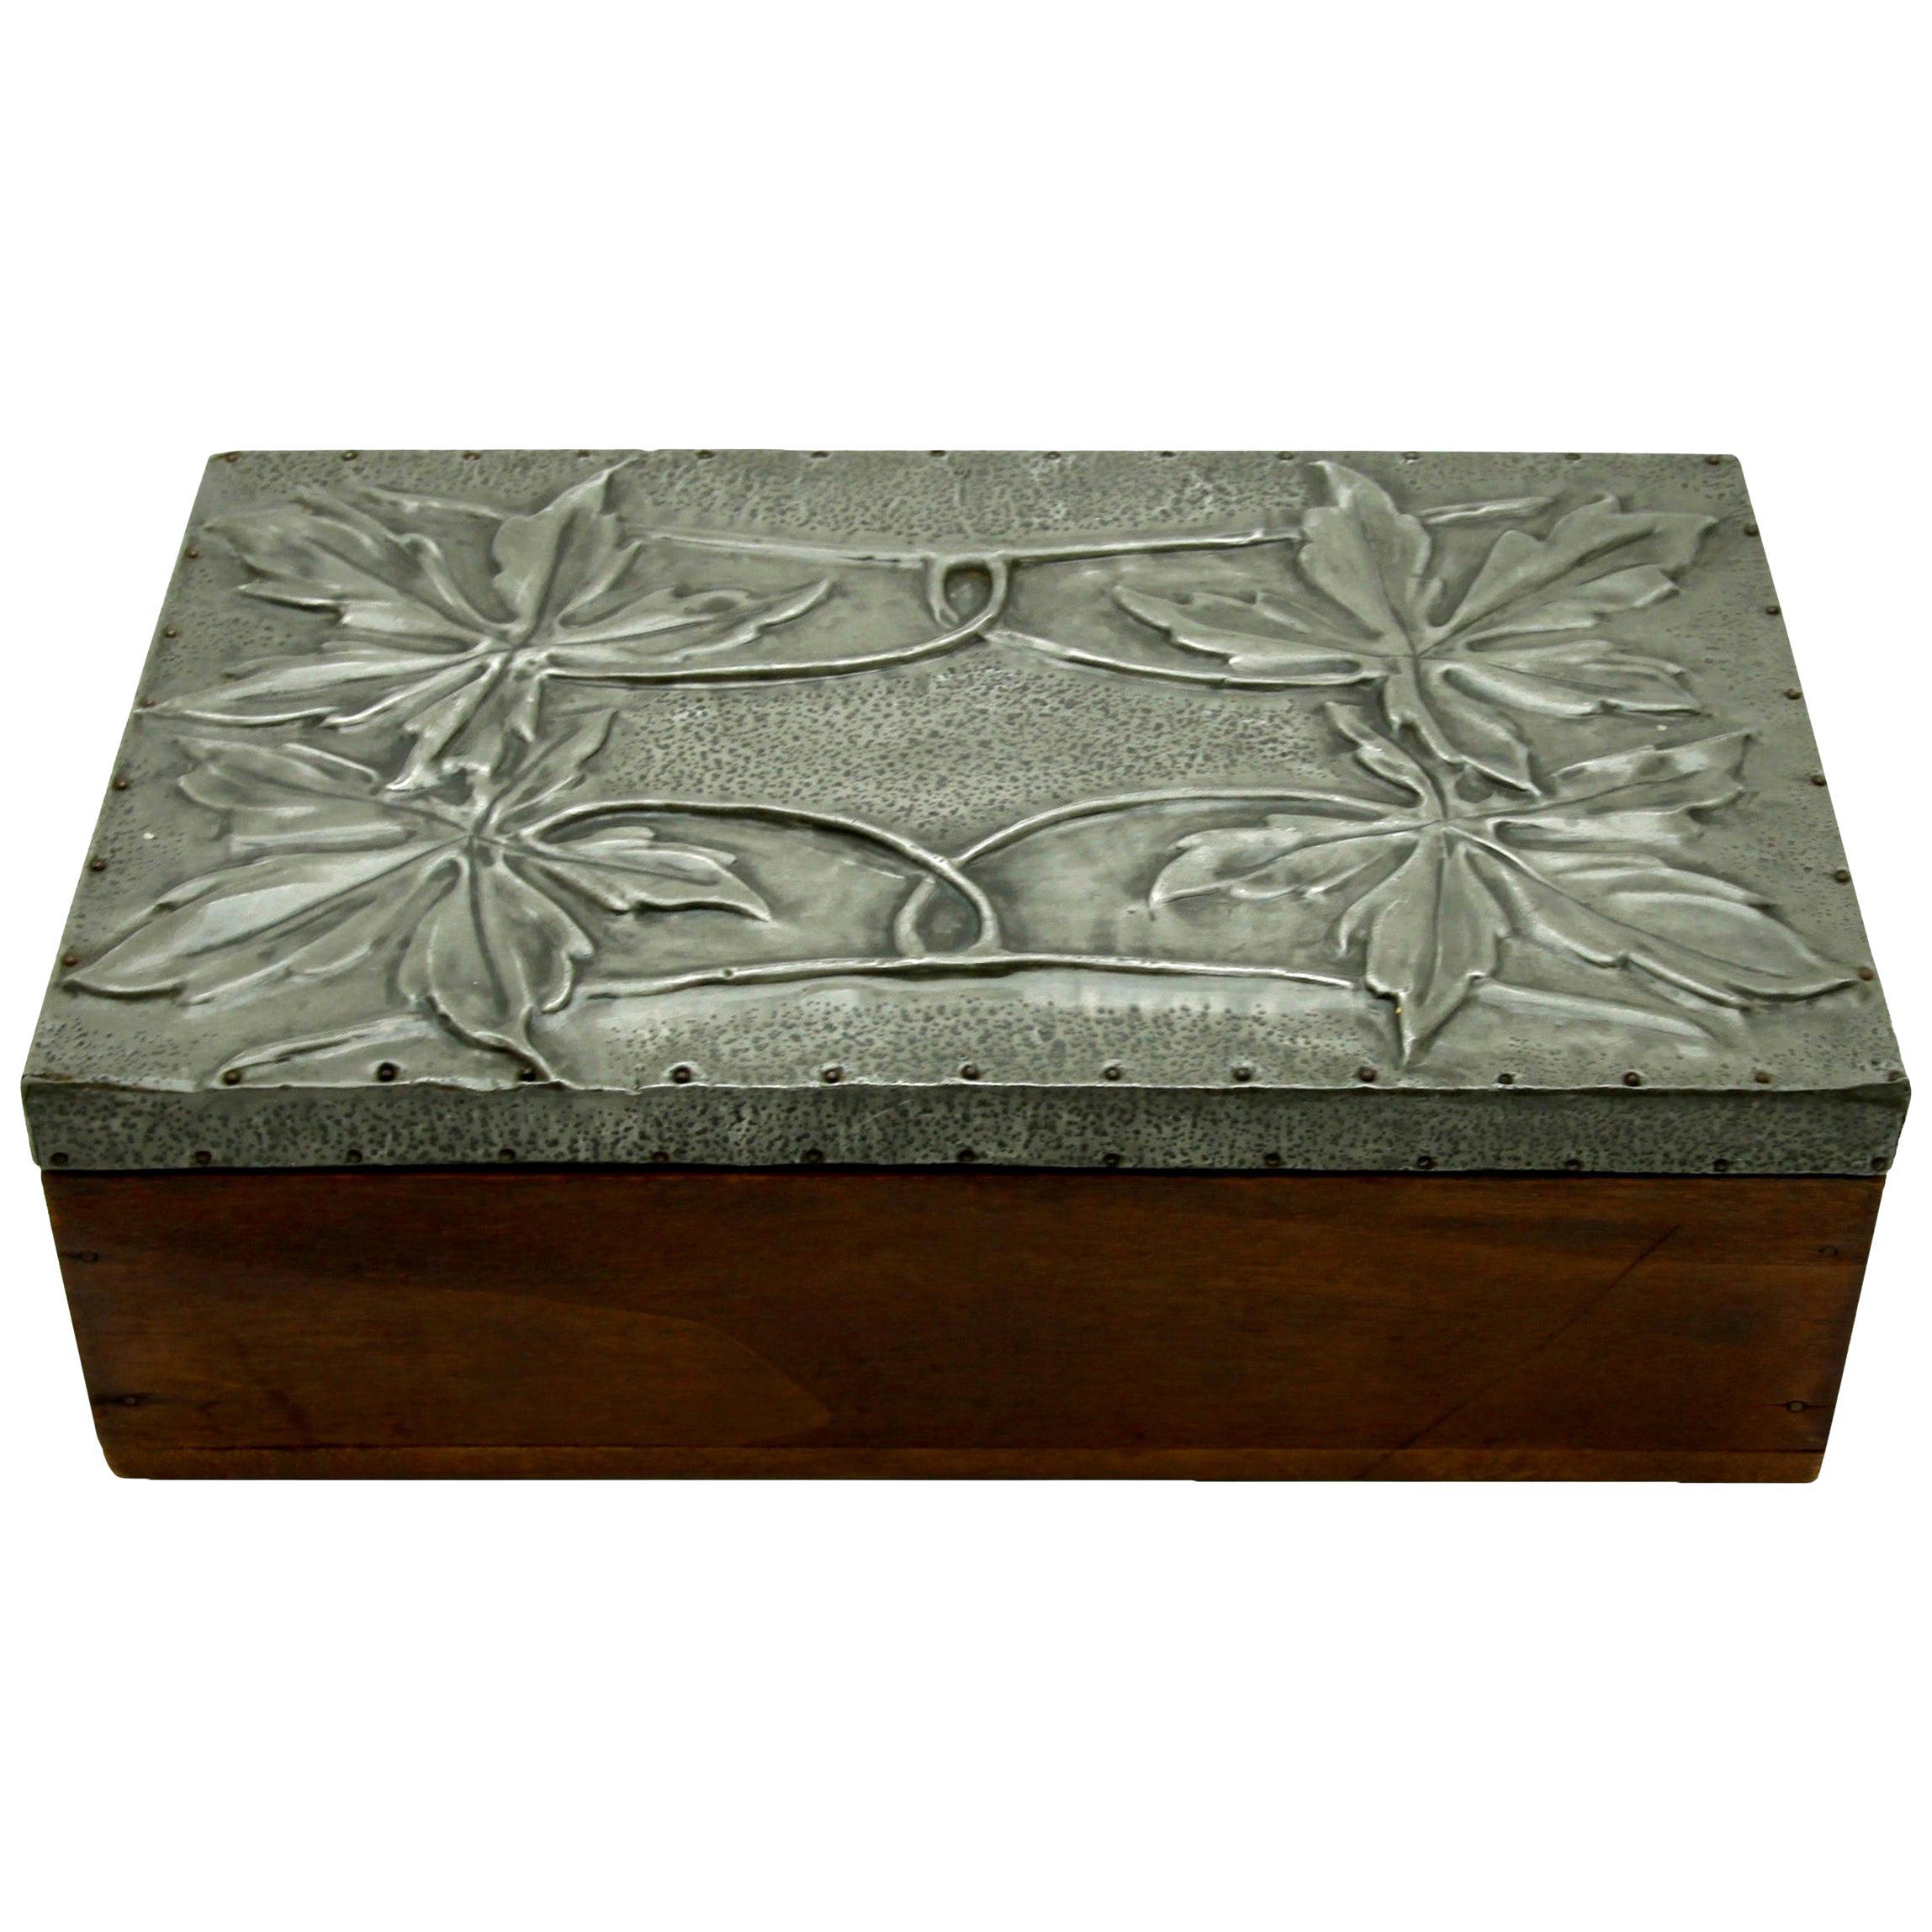 Arts & Crafts Box with Decorative Metal Work, circa 1920